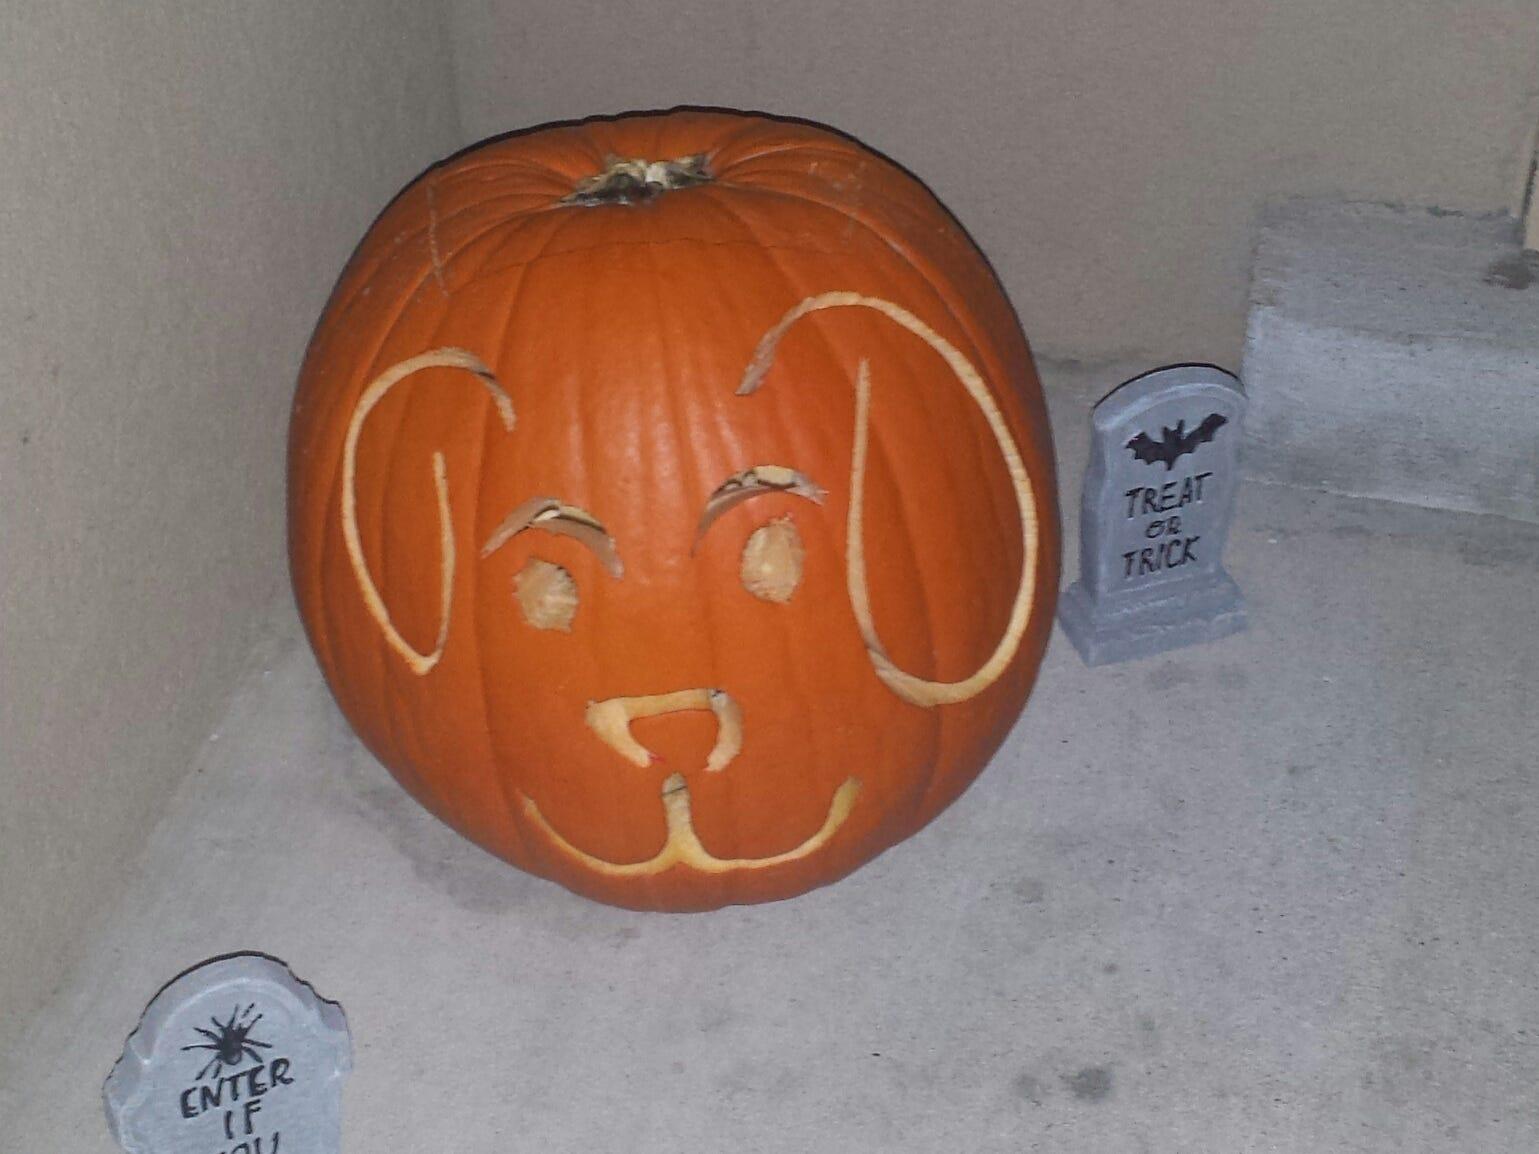 Pumpkin by Evan Smith and Maddie Strom.